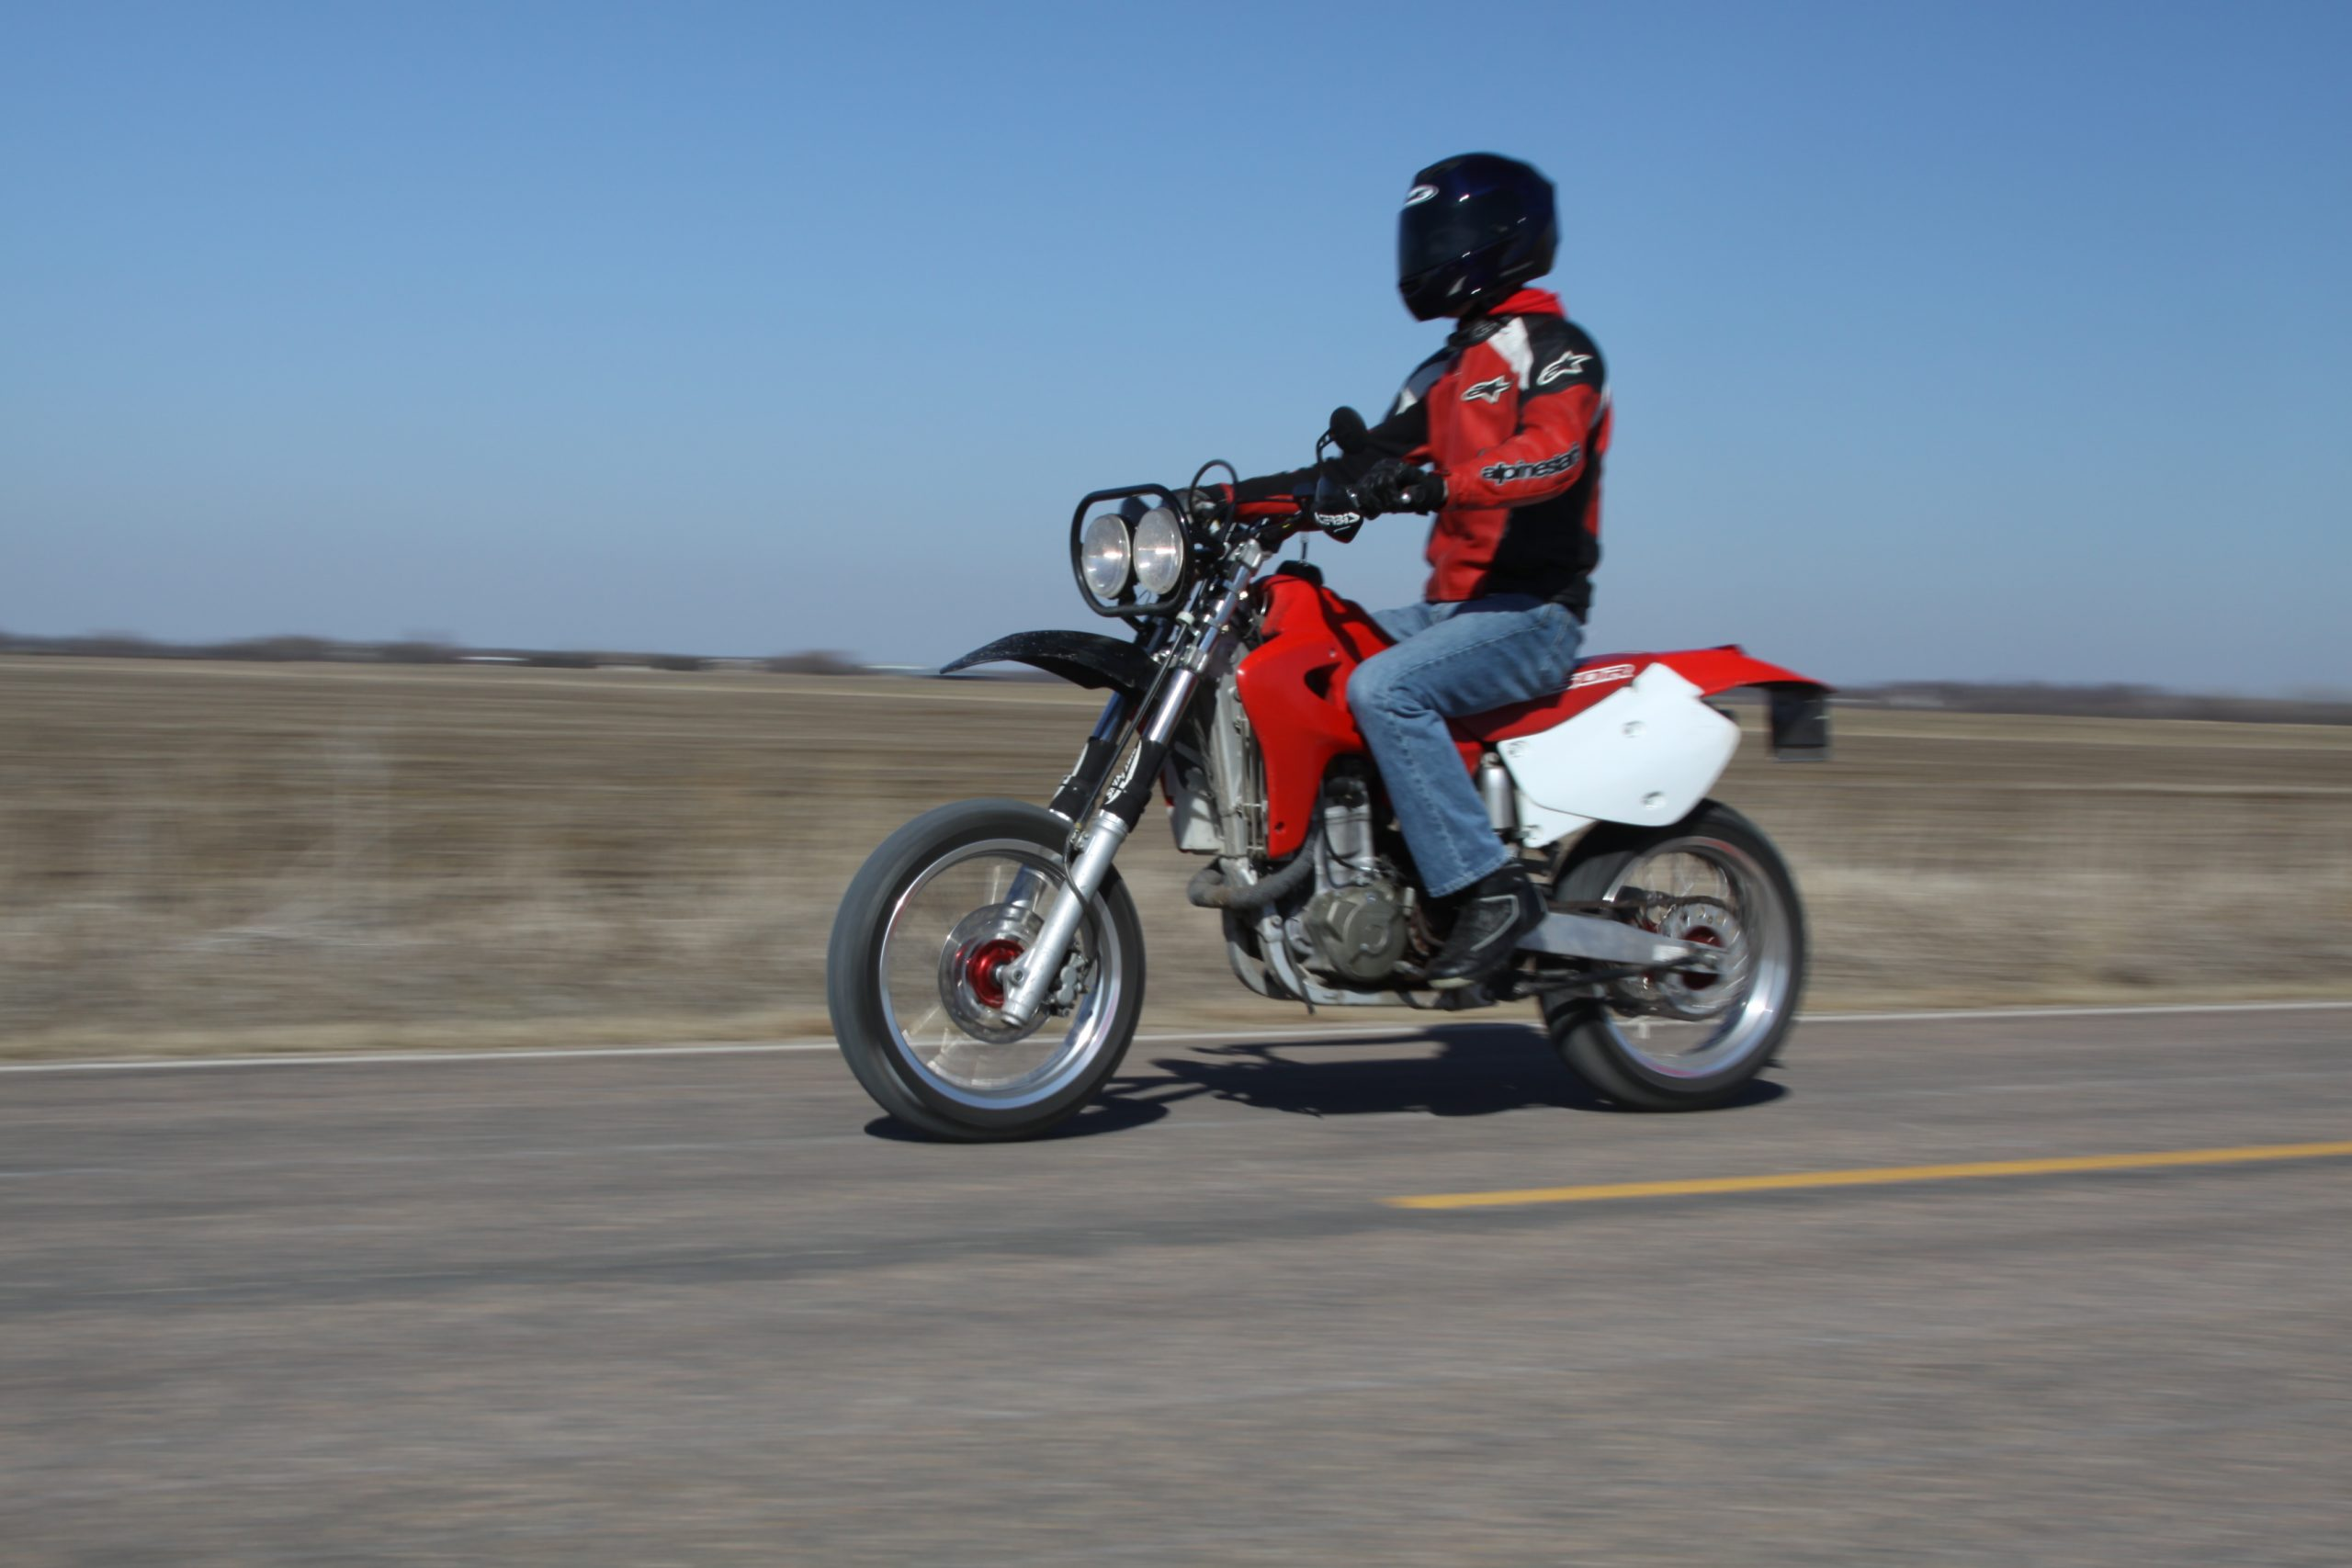 XR650R supermoto